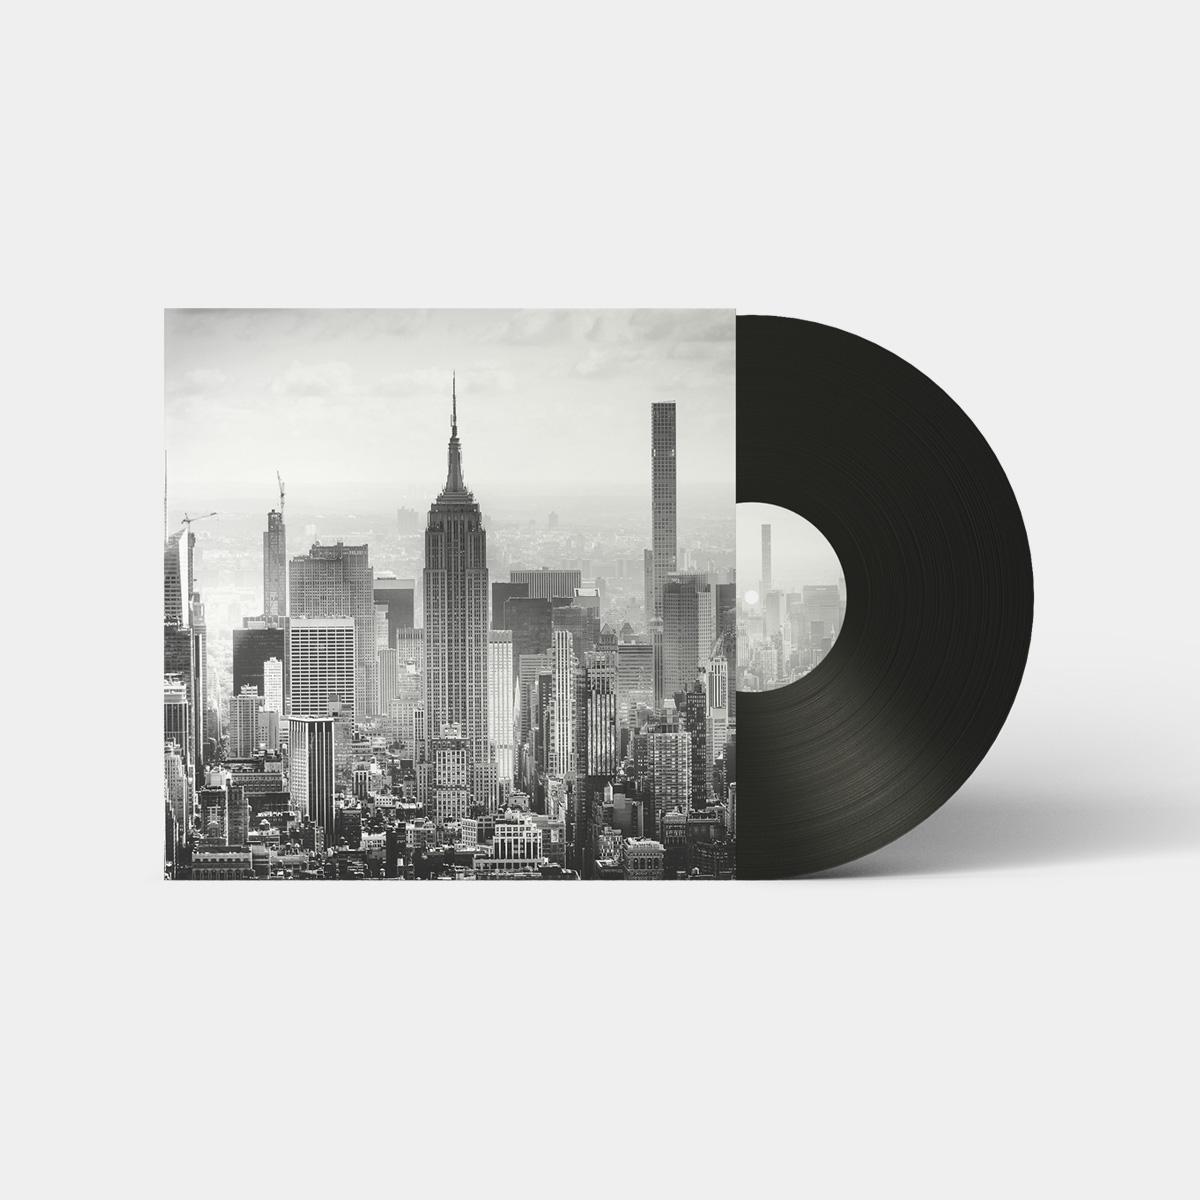 mockup vinyl